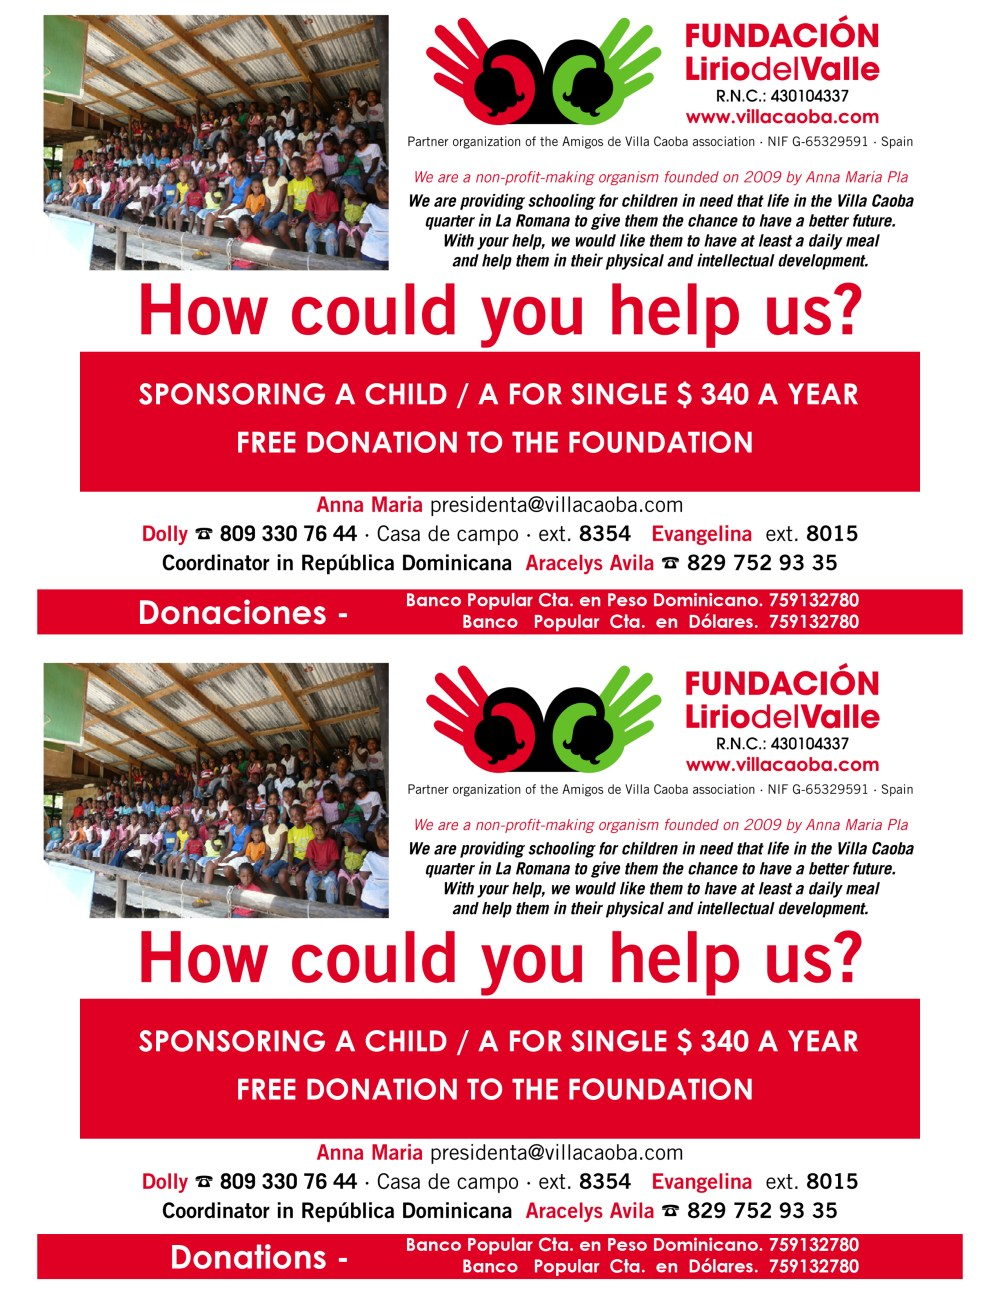 Fundación Lirio del Valle How You Can Help